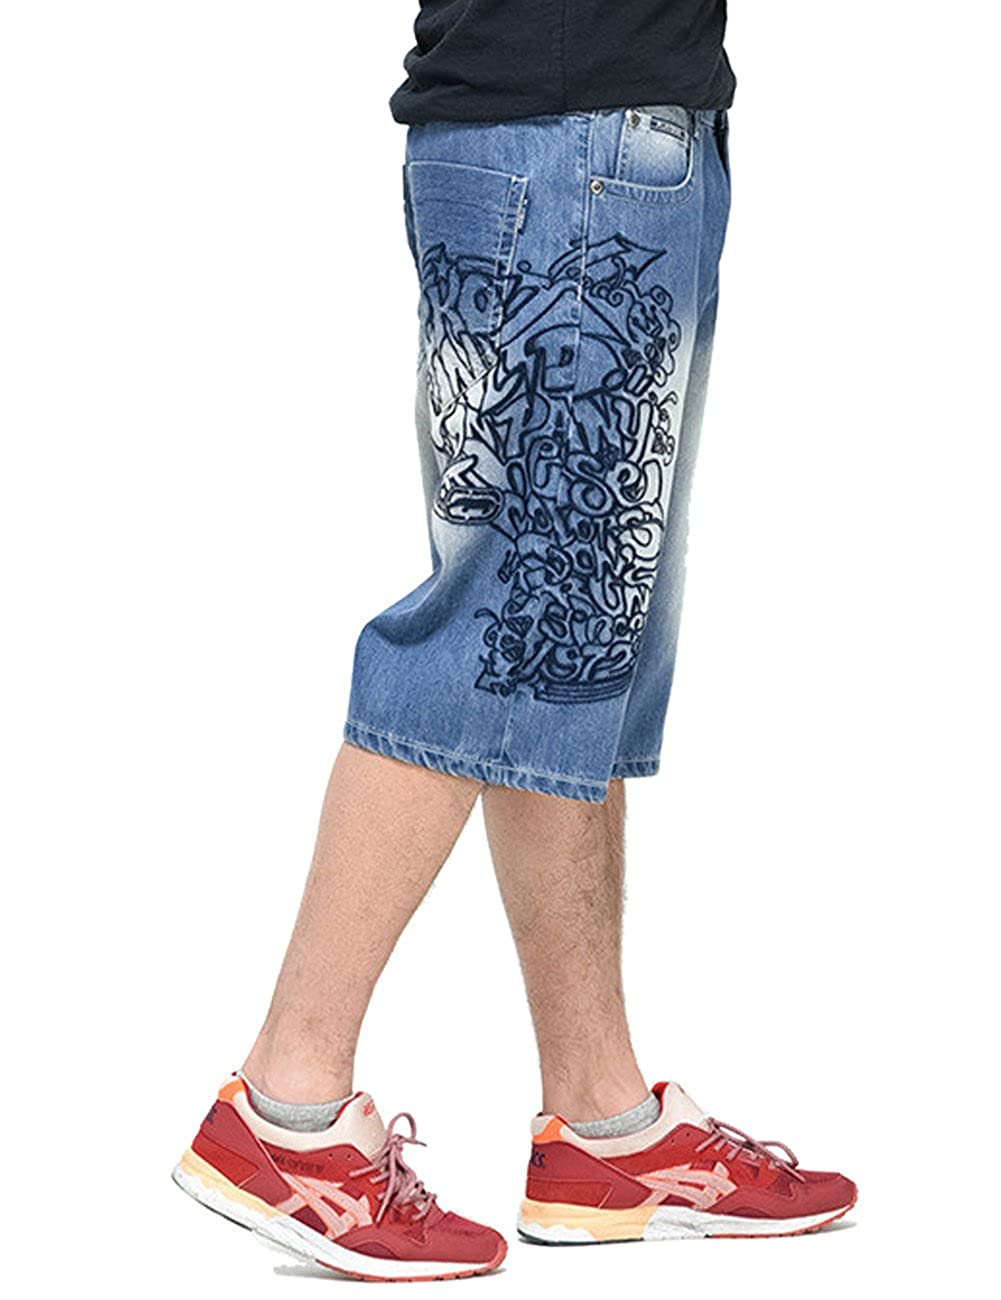 QBO Men's Hip Hop Jeans Embroidery Baggy Denim Shorts